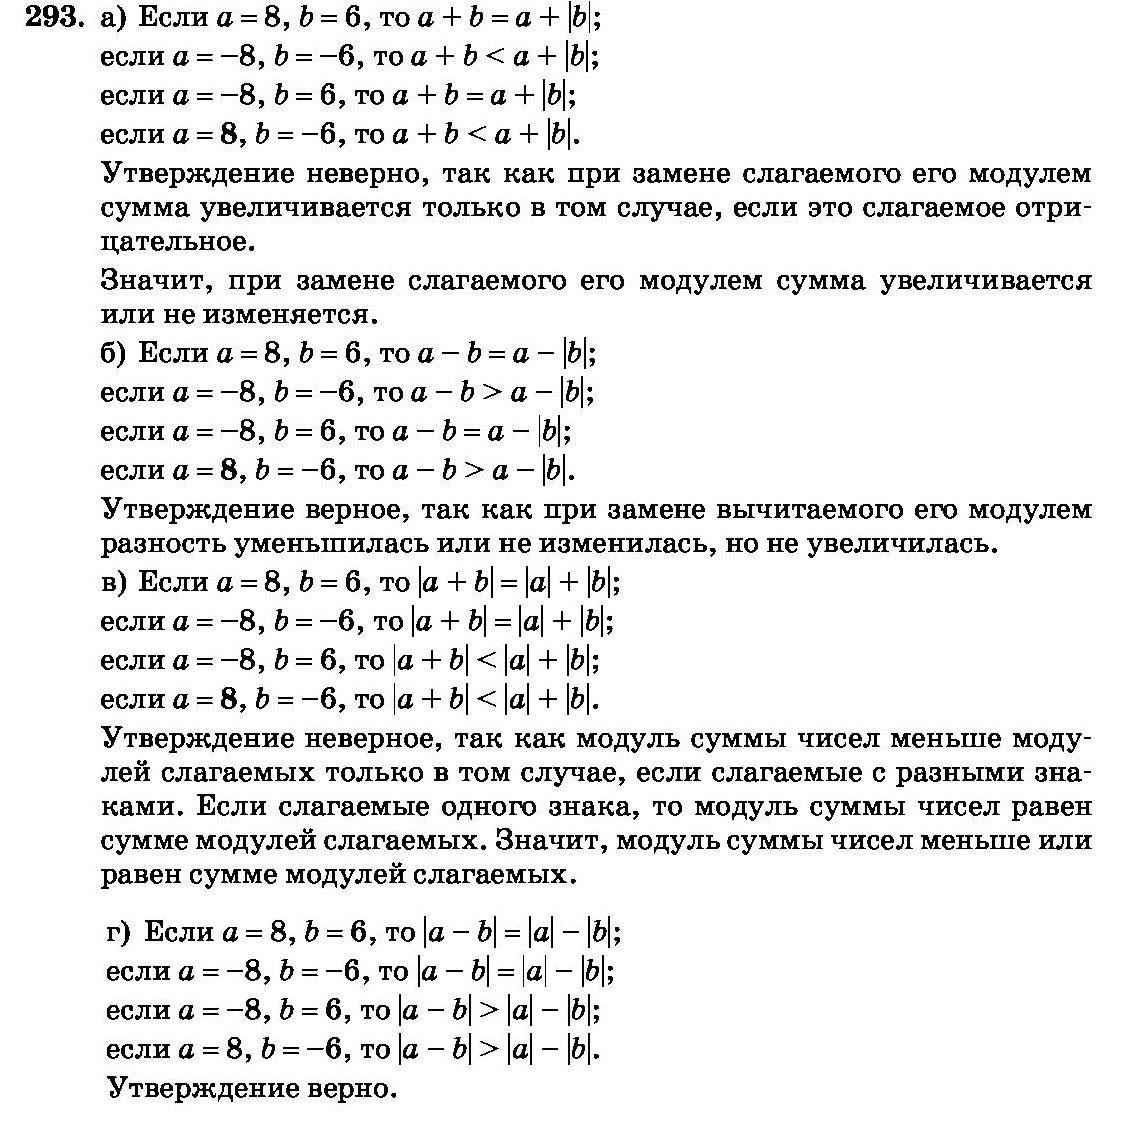 Решебник по химии 8 класс габриелян спиши.ру